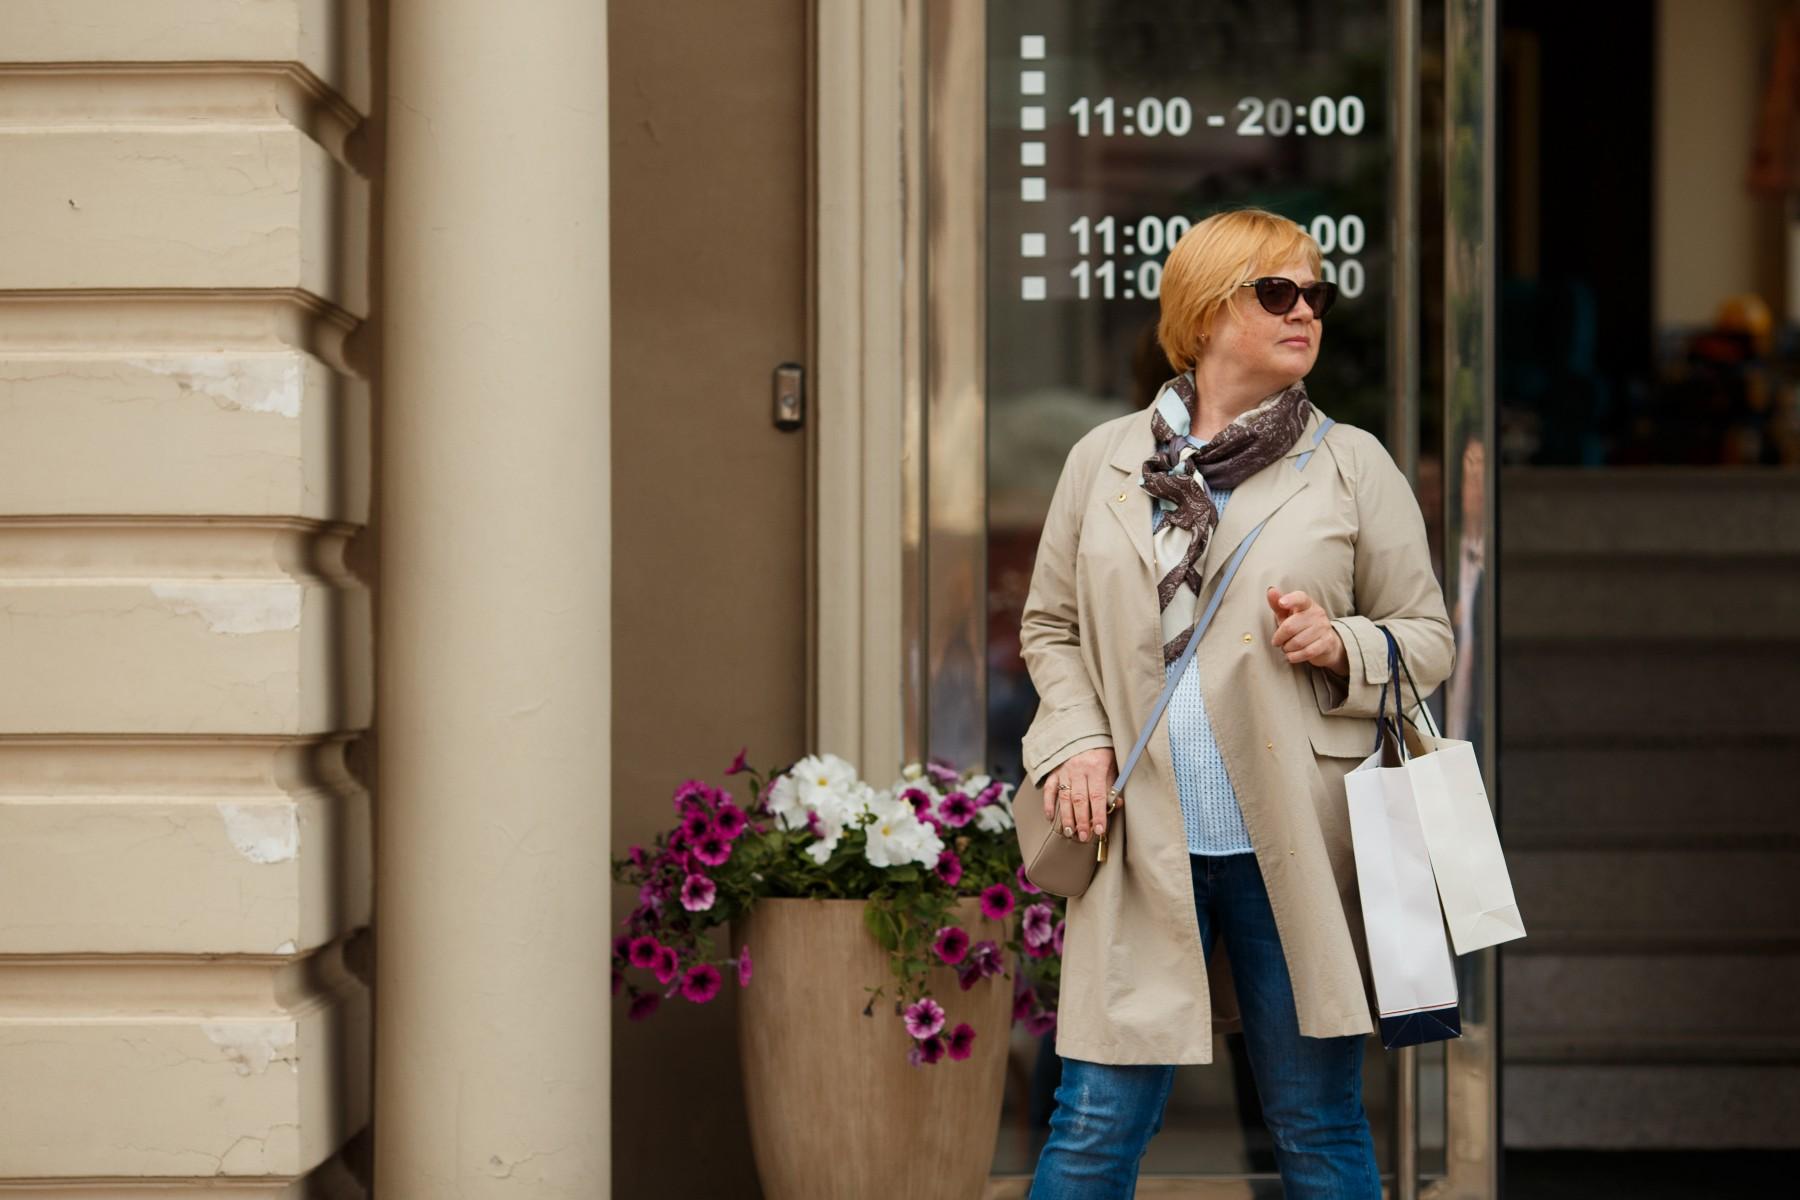 Woman shopping in Russia